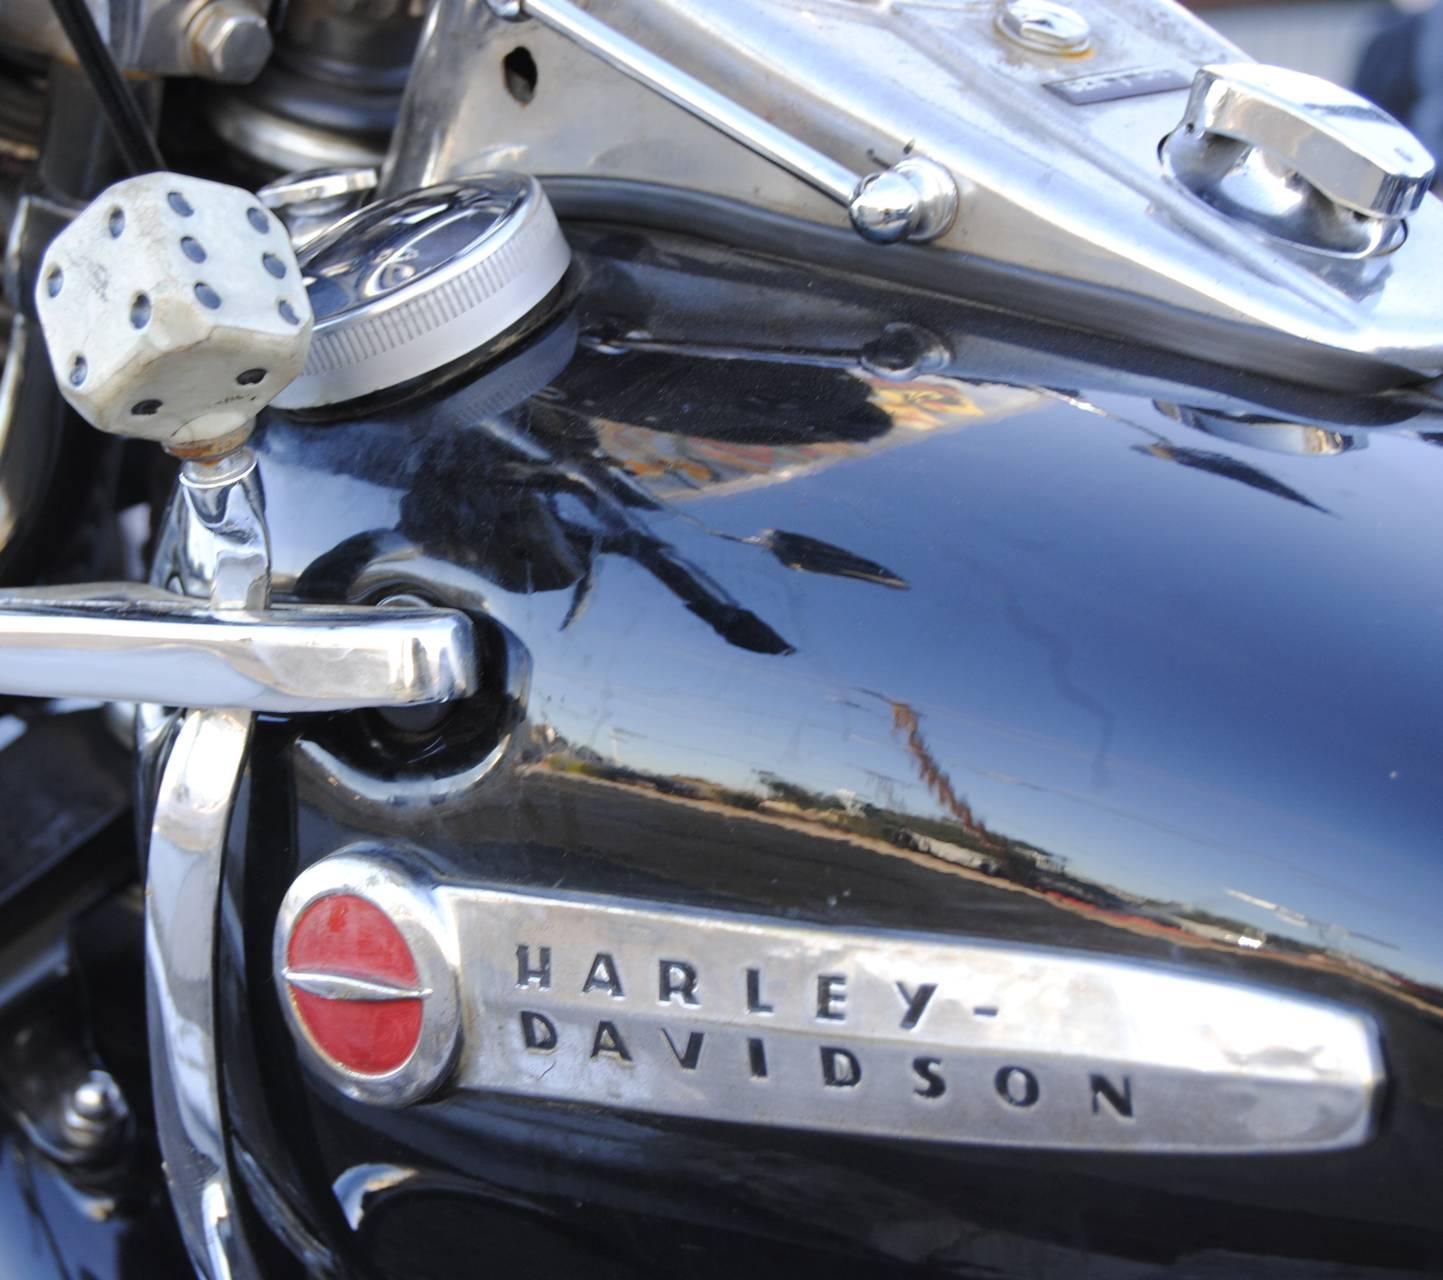 A Harley 10